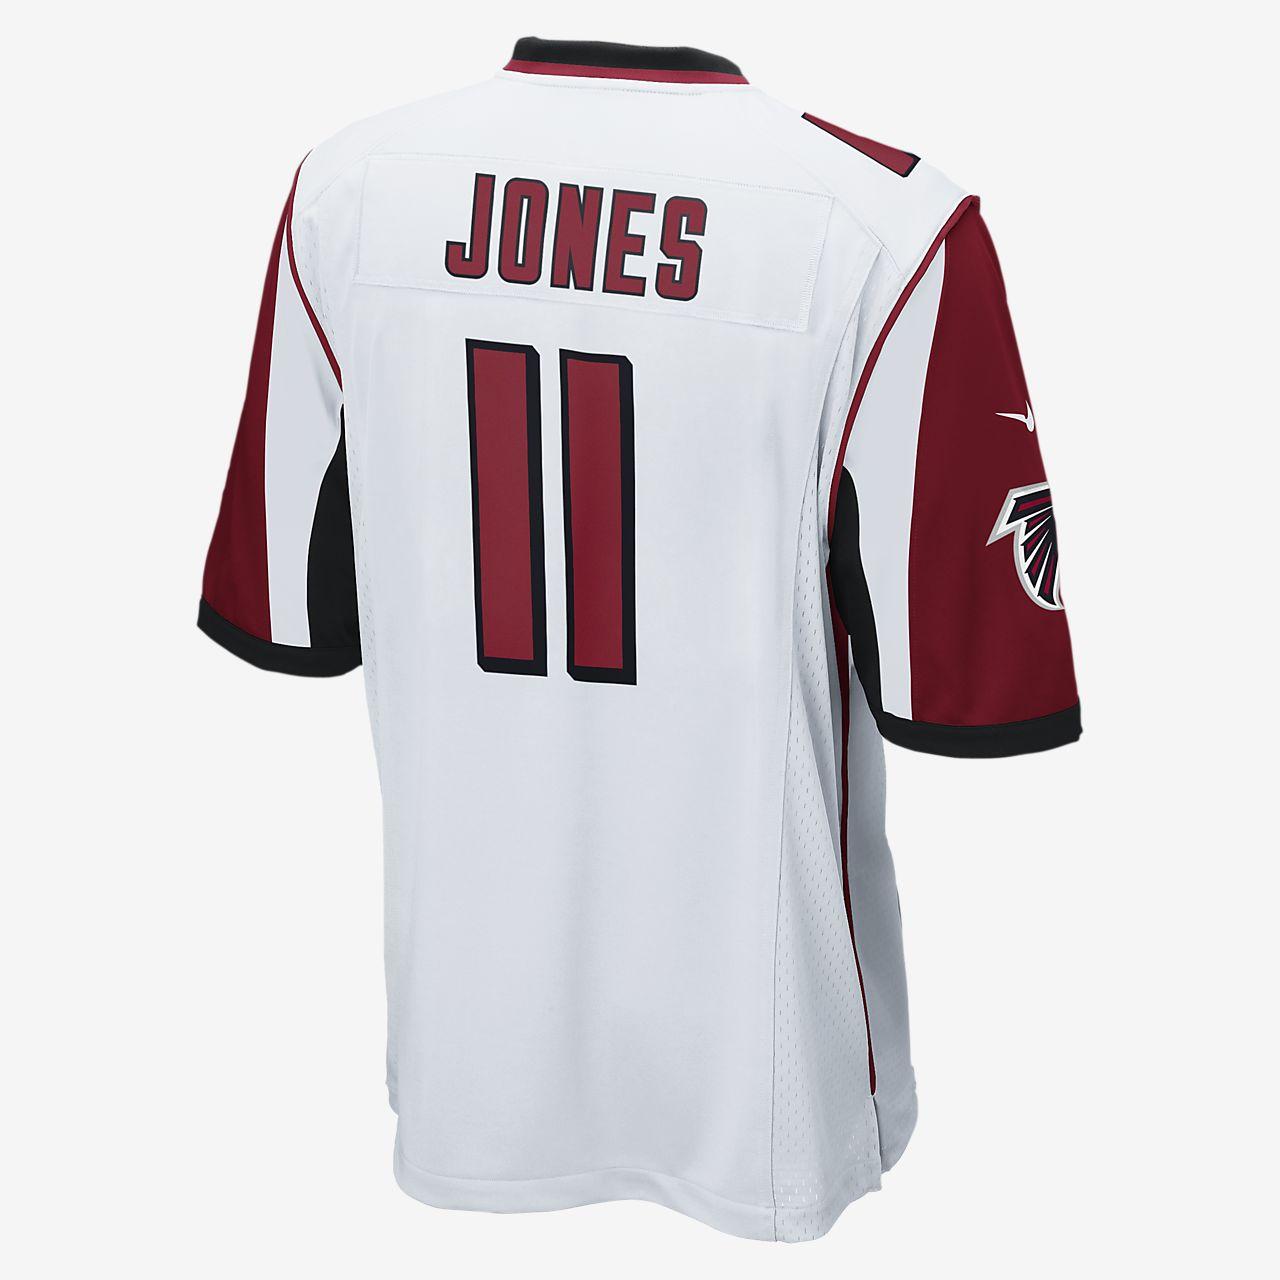 656ac683e NFL Atlanta Falcons (Julio Jones) Men s Football Away Game Jersey ...